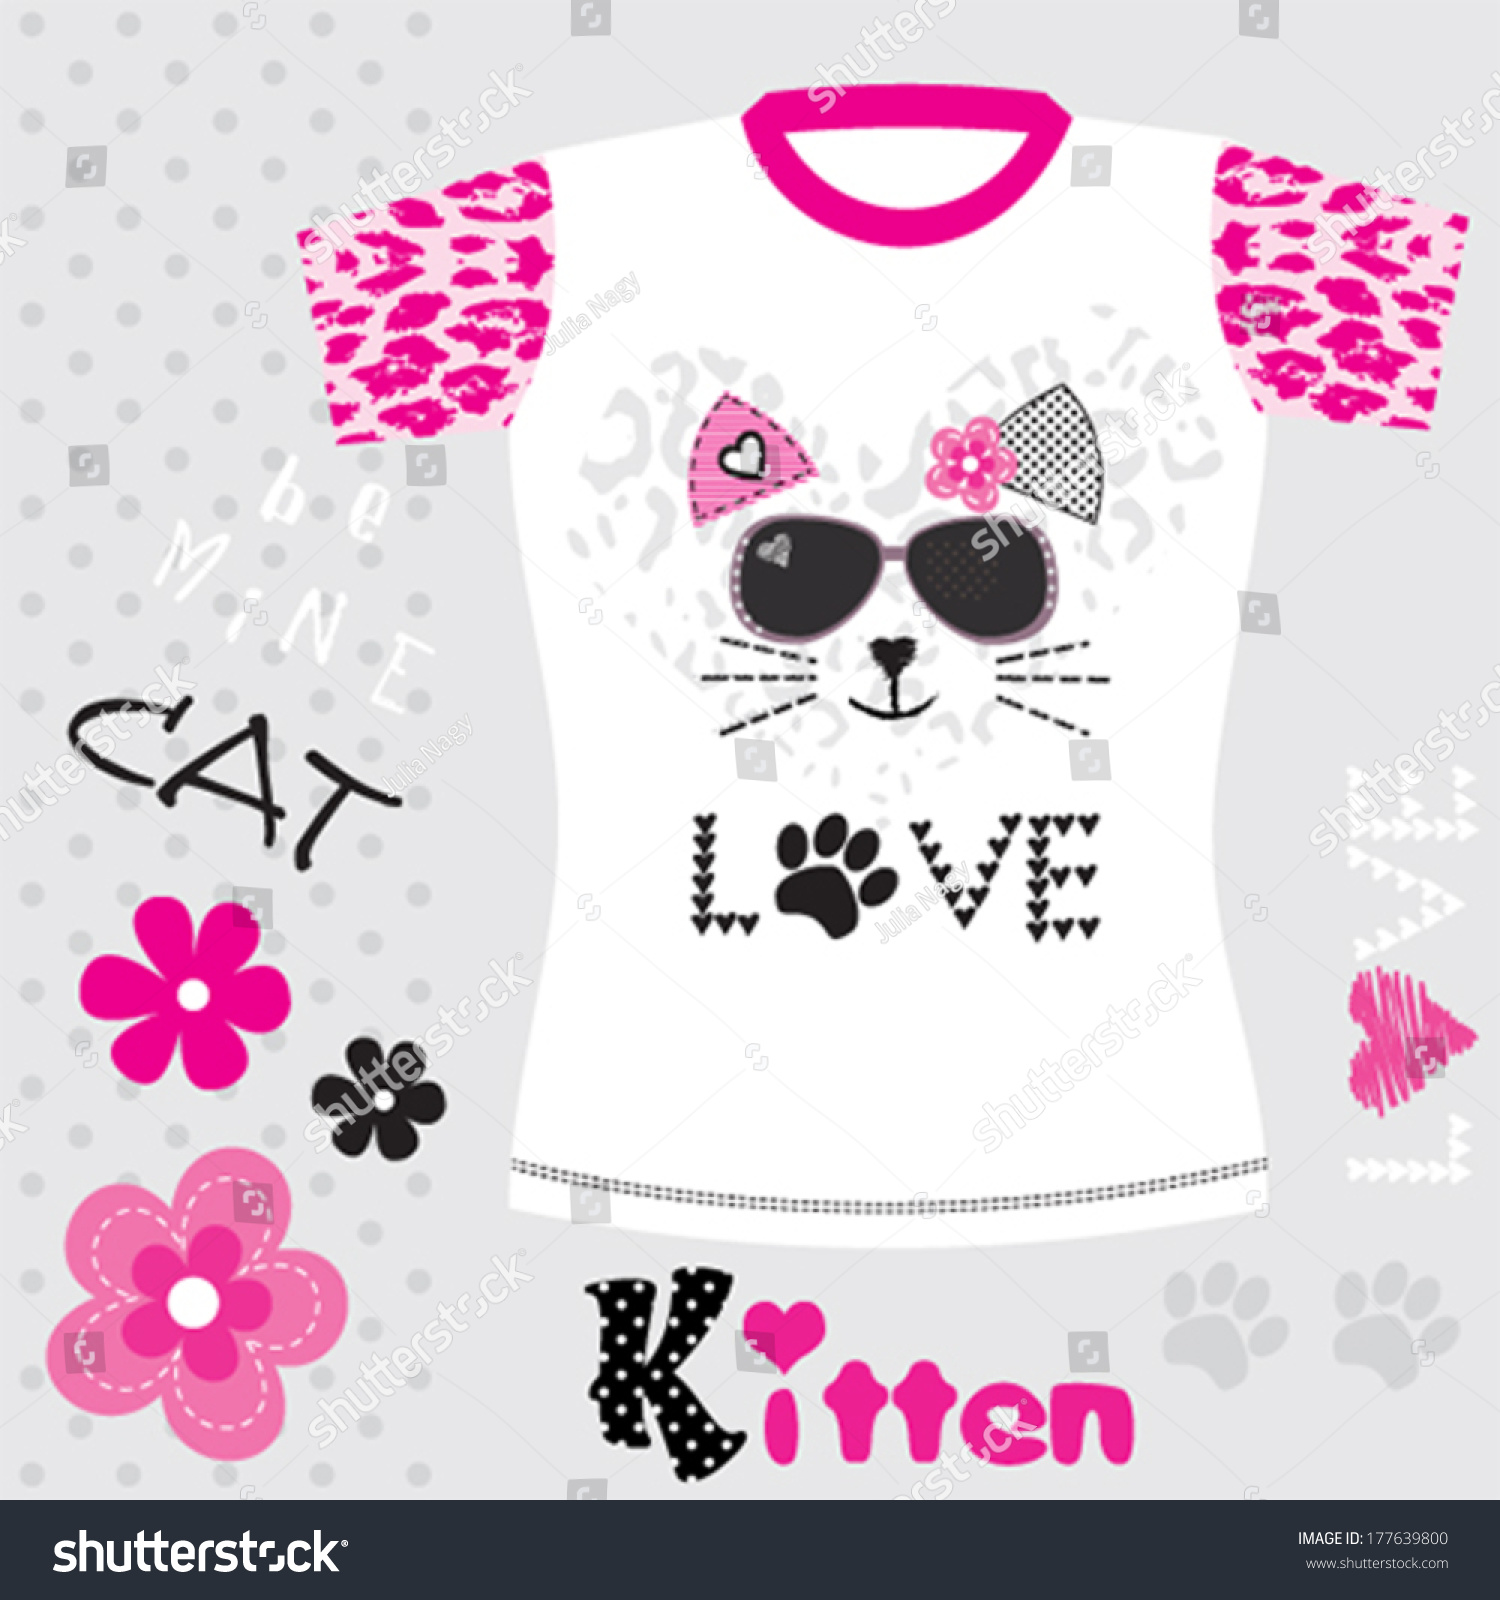 Shirt design in girl - Cute Cat Girl Tshirt Design Kids Fashion Vector Illustration